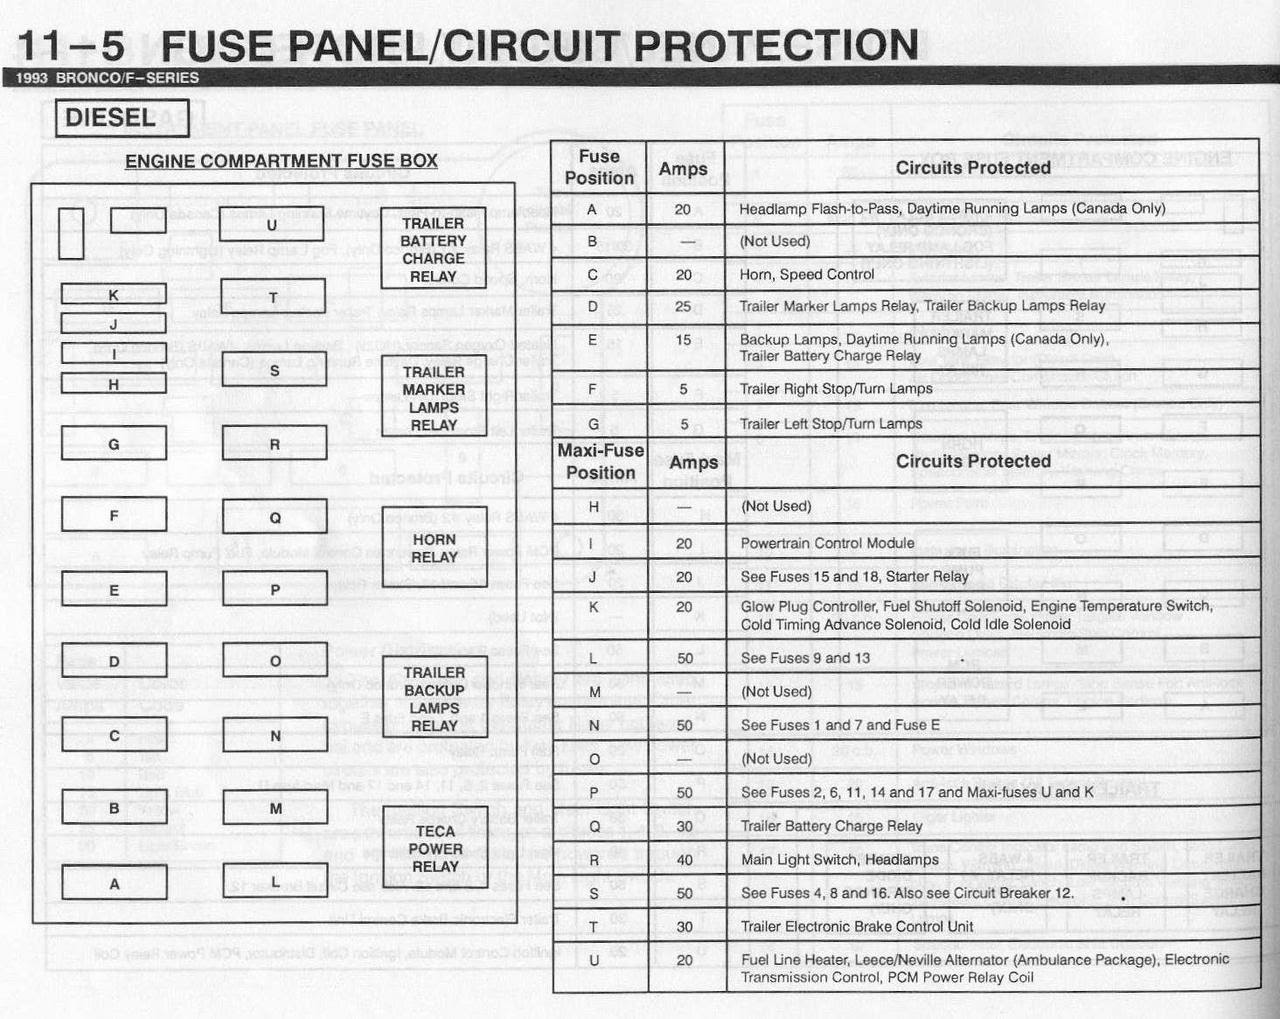 2007 ford f 250 fuse box diagram 35 2008 ford f250 fuse box diagram wiring diagram list  35 2008 ford f250 fuse box diagram